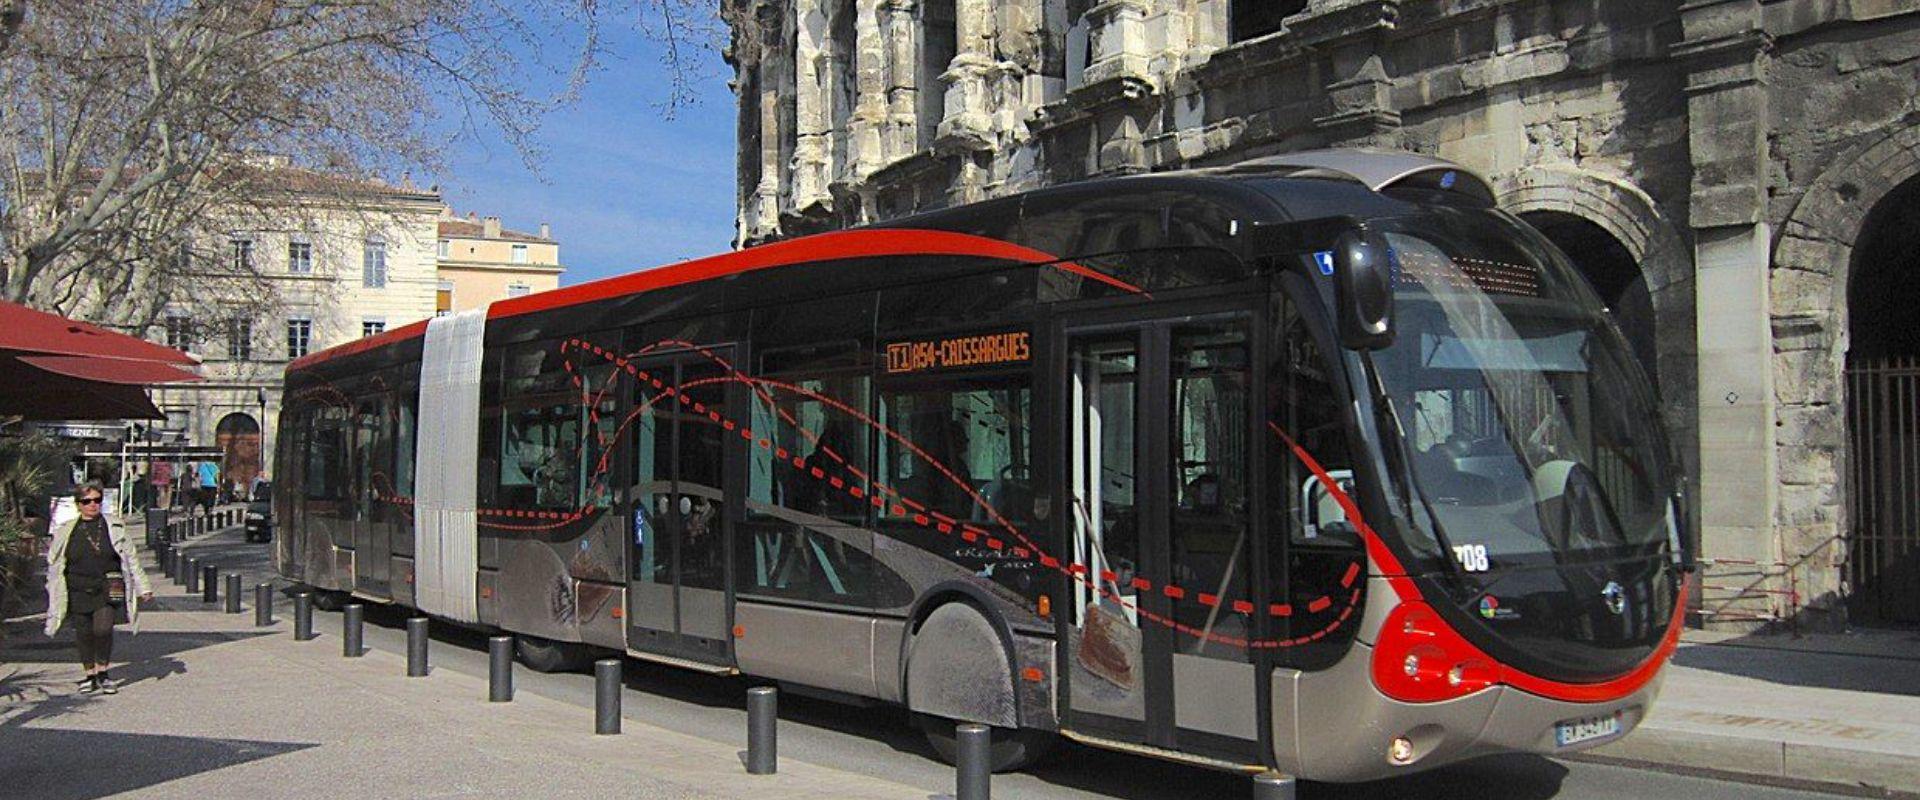 Transports propres<br><span> et mobilité verte</span>